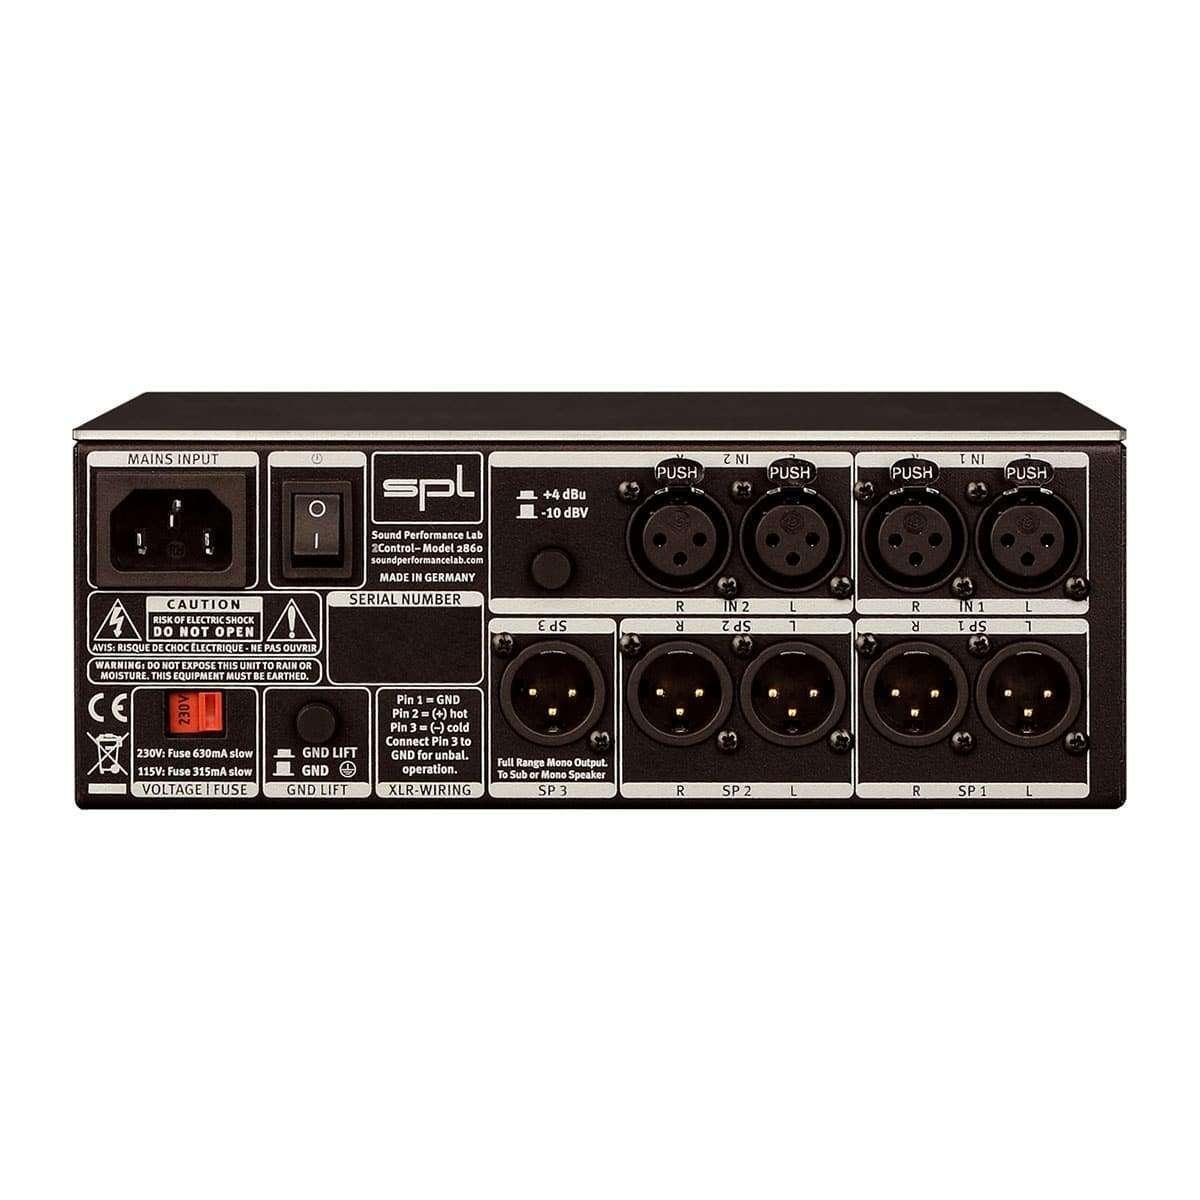 SPL 2 Control 05 SPL 2 Control